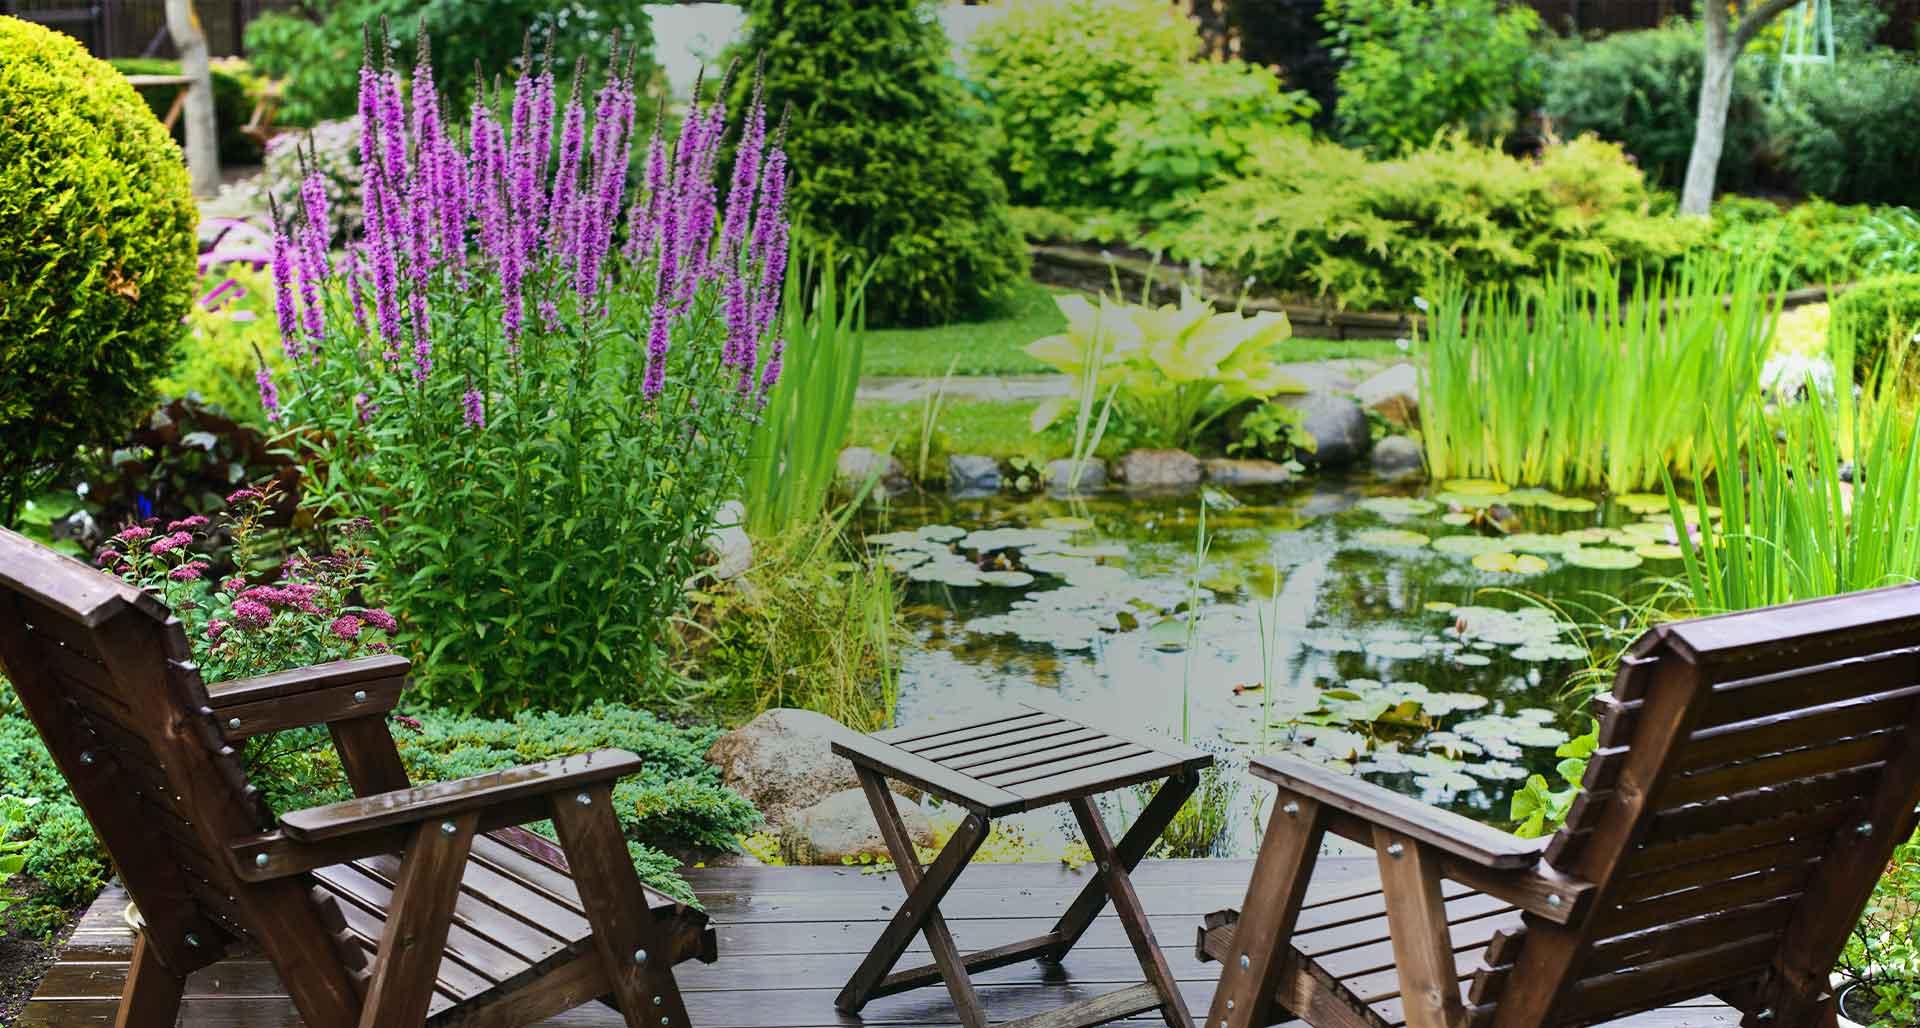 Jardineries Truffaut : Spécialiste Jardin, Animaux, Maison ... tout Bordure Jardin Pas Cher